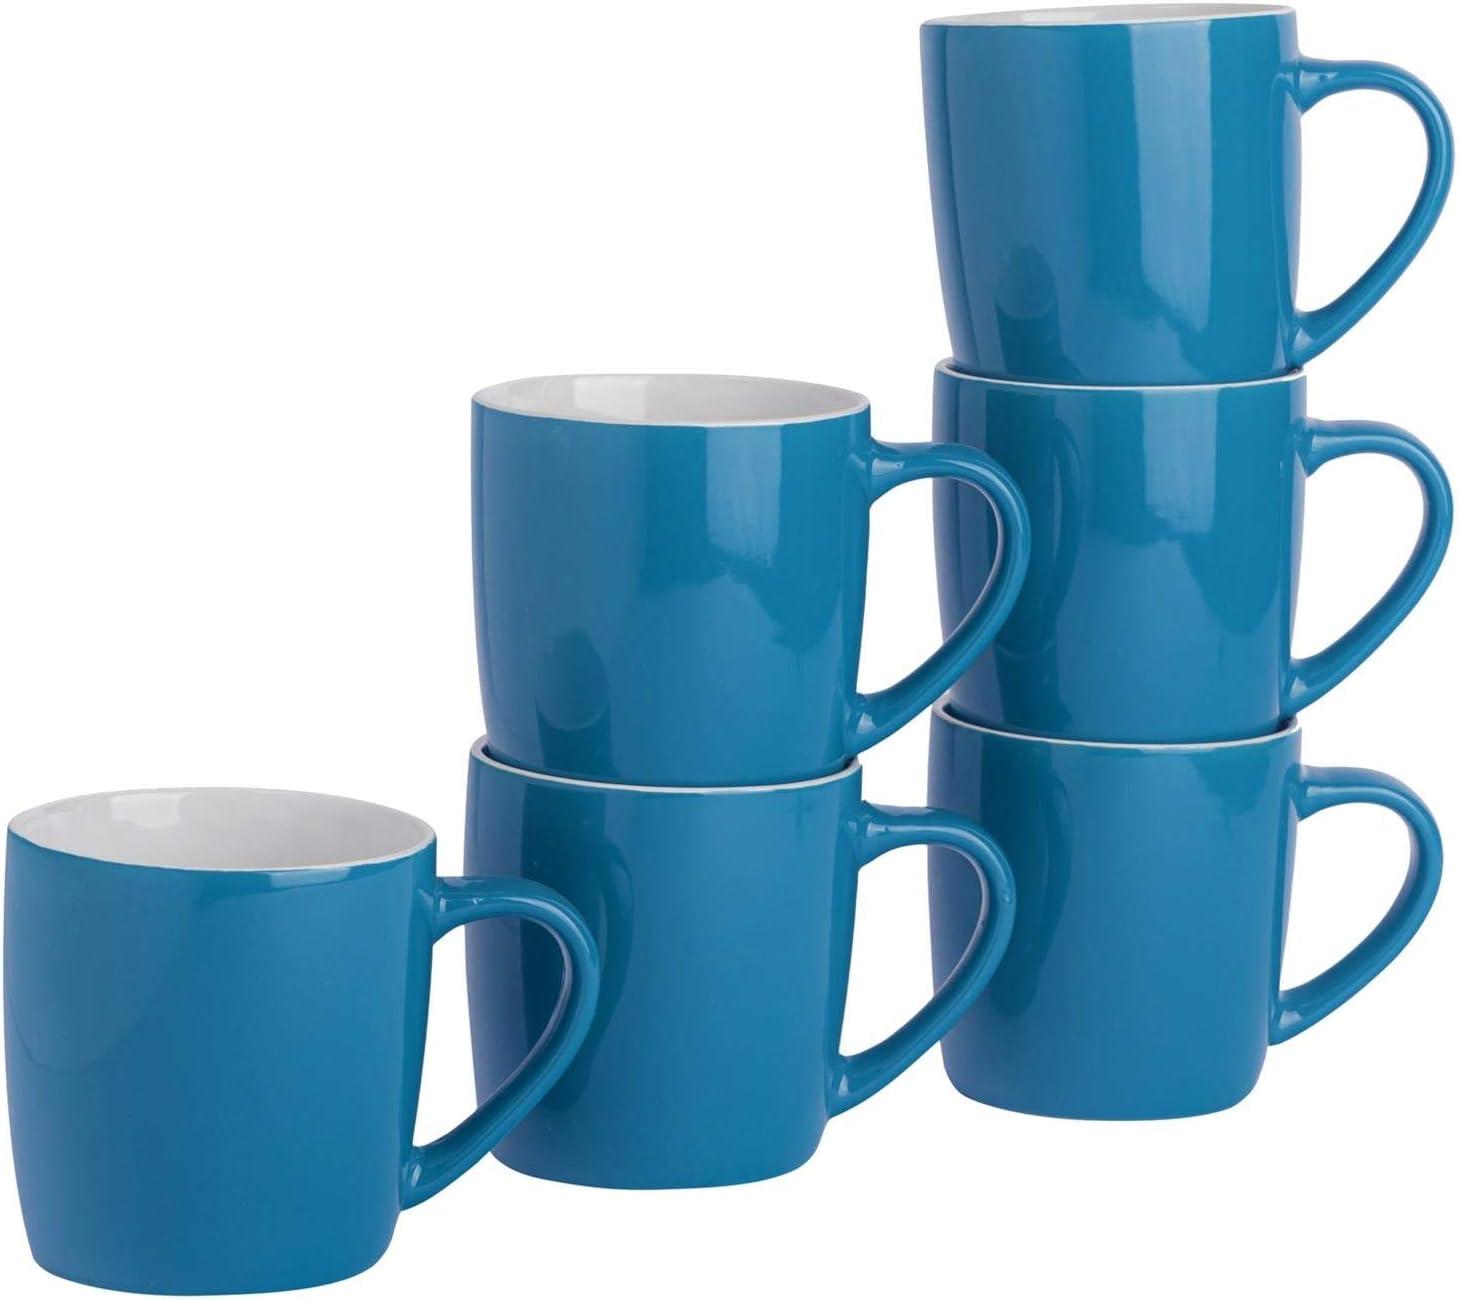 Argon Tableware Tea Coffee Mugs Contemporary Cera 6pc - OFFicial Sales for sale Coloured